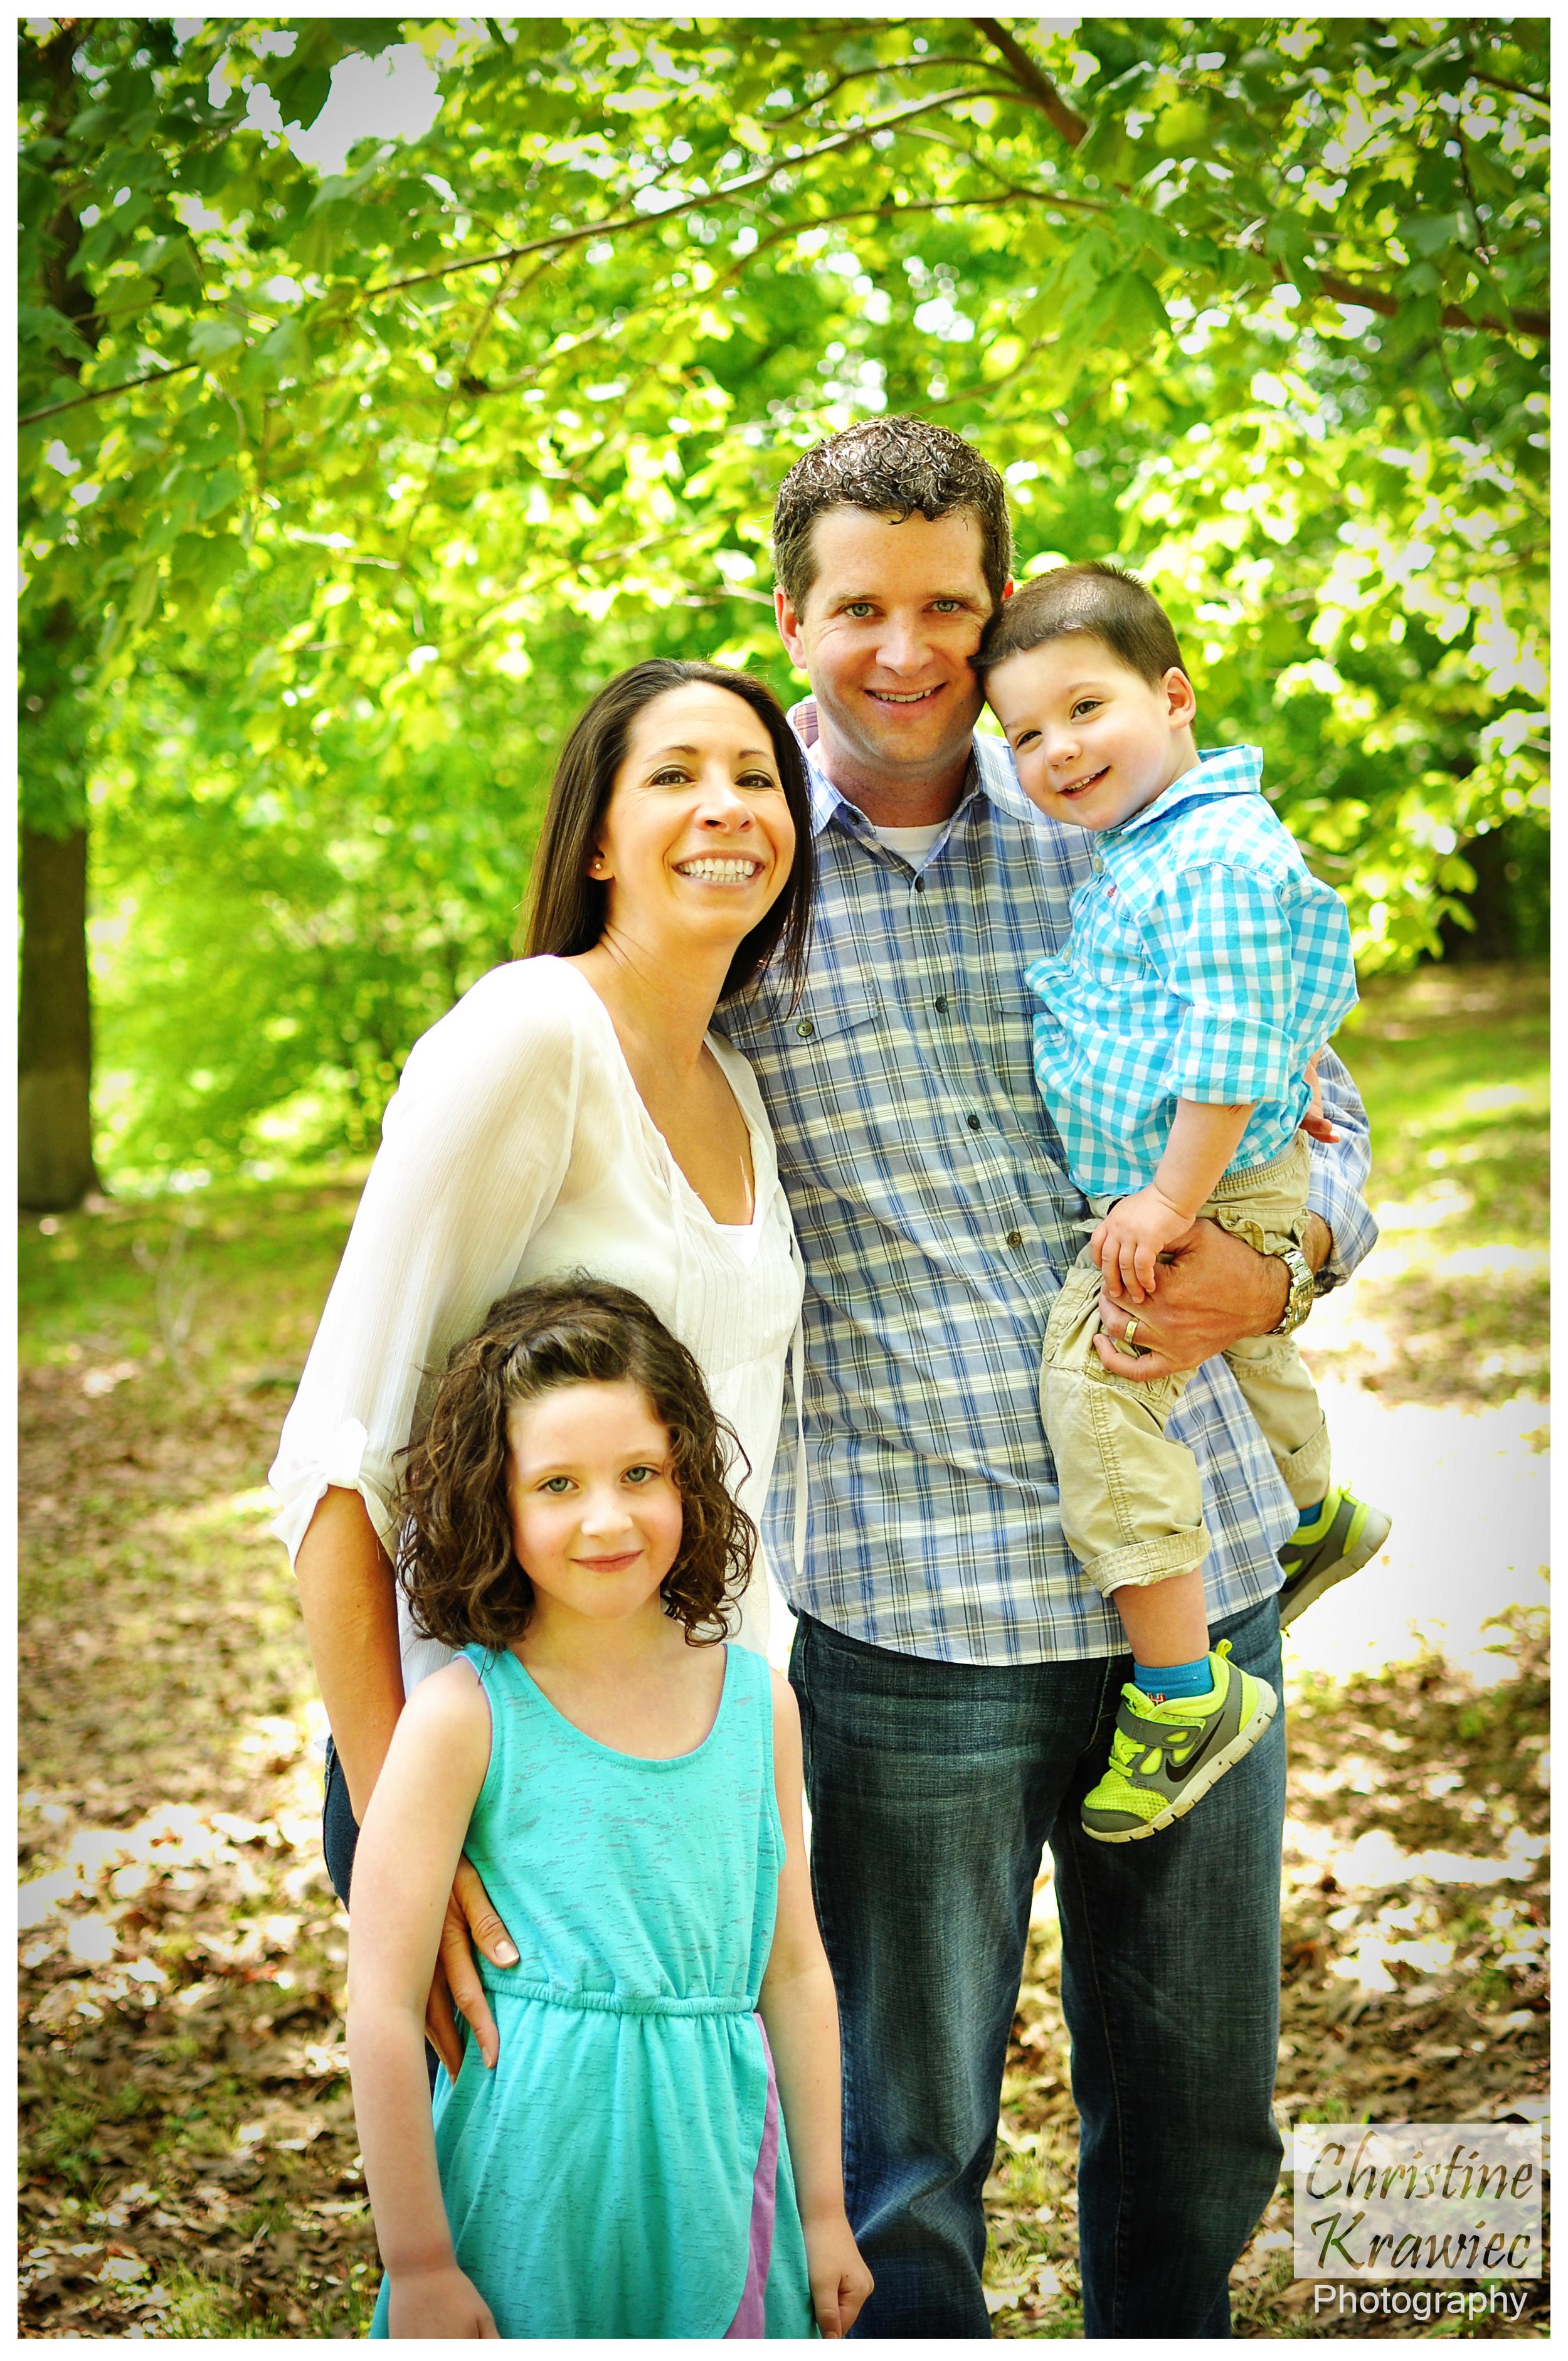 Christine KRawiec Photography - Haddonfield Family Photographer